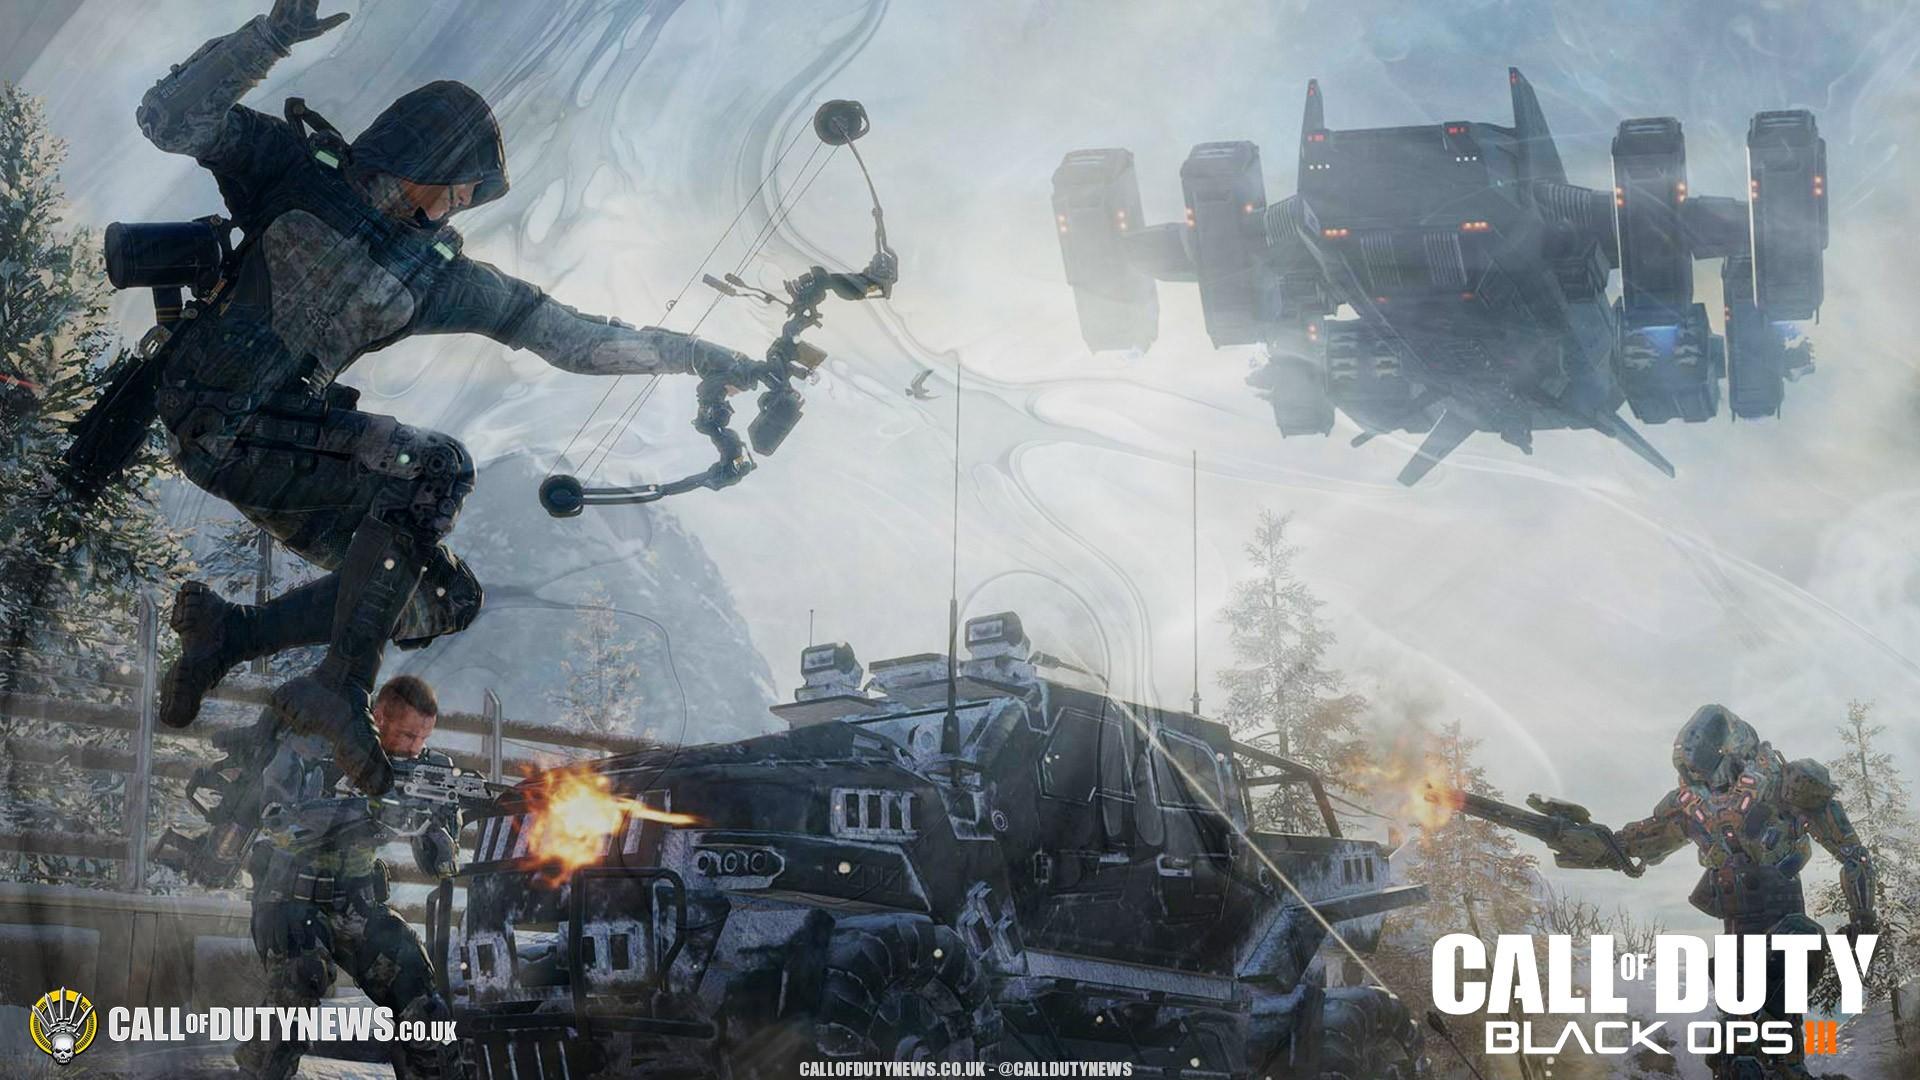 black ops 3 bo3 wallpaper 9 Call of Duty Blog 1920x1080